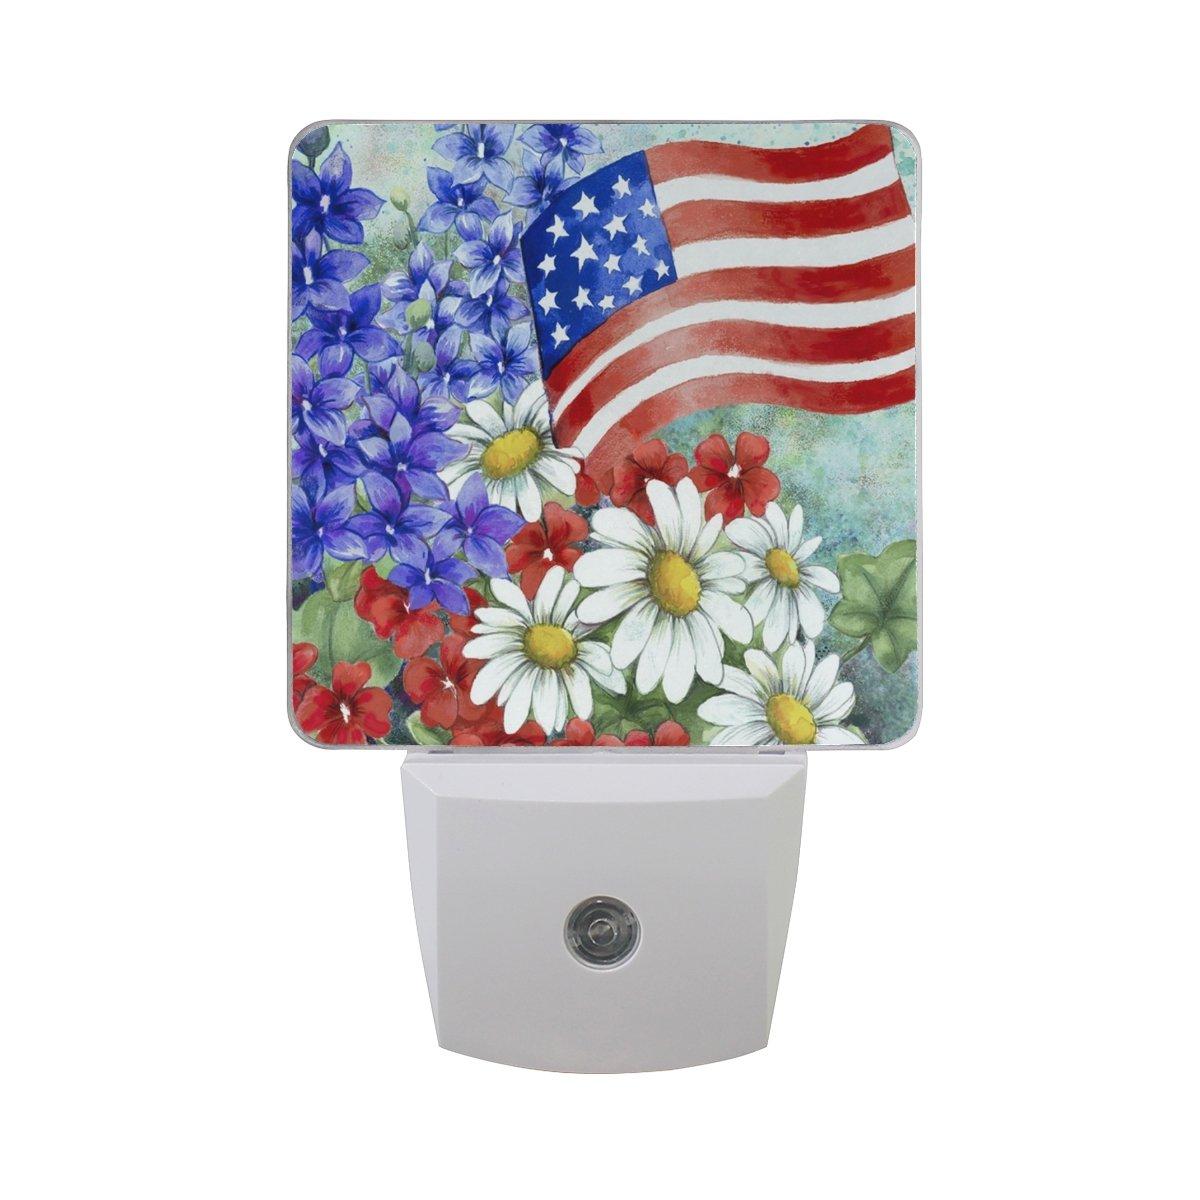 2 Pack Plug-in Night Light LED Lamp America Summer Flower Printing with Dusk to Dawn Sensor for Bedroom, Bathroom, Hallway, Stairways, 0.5W by DIY.HD